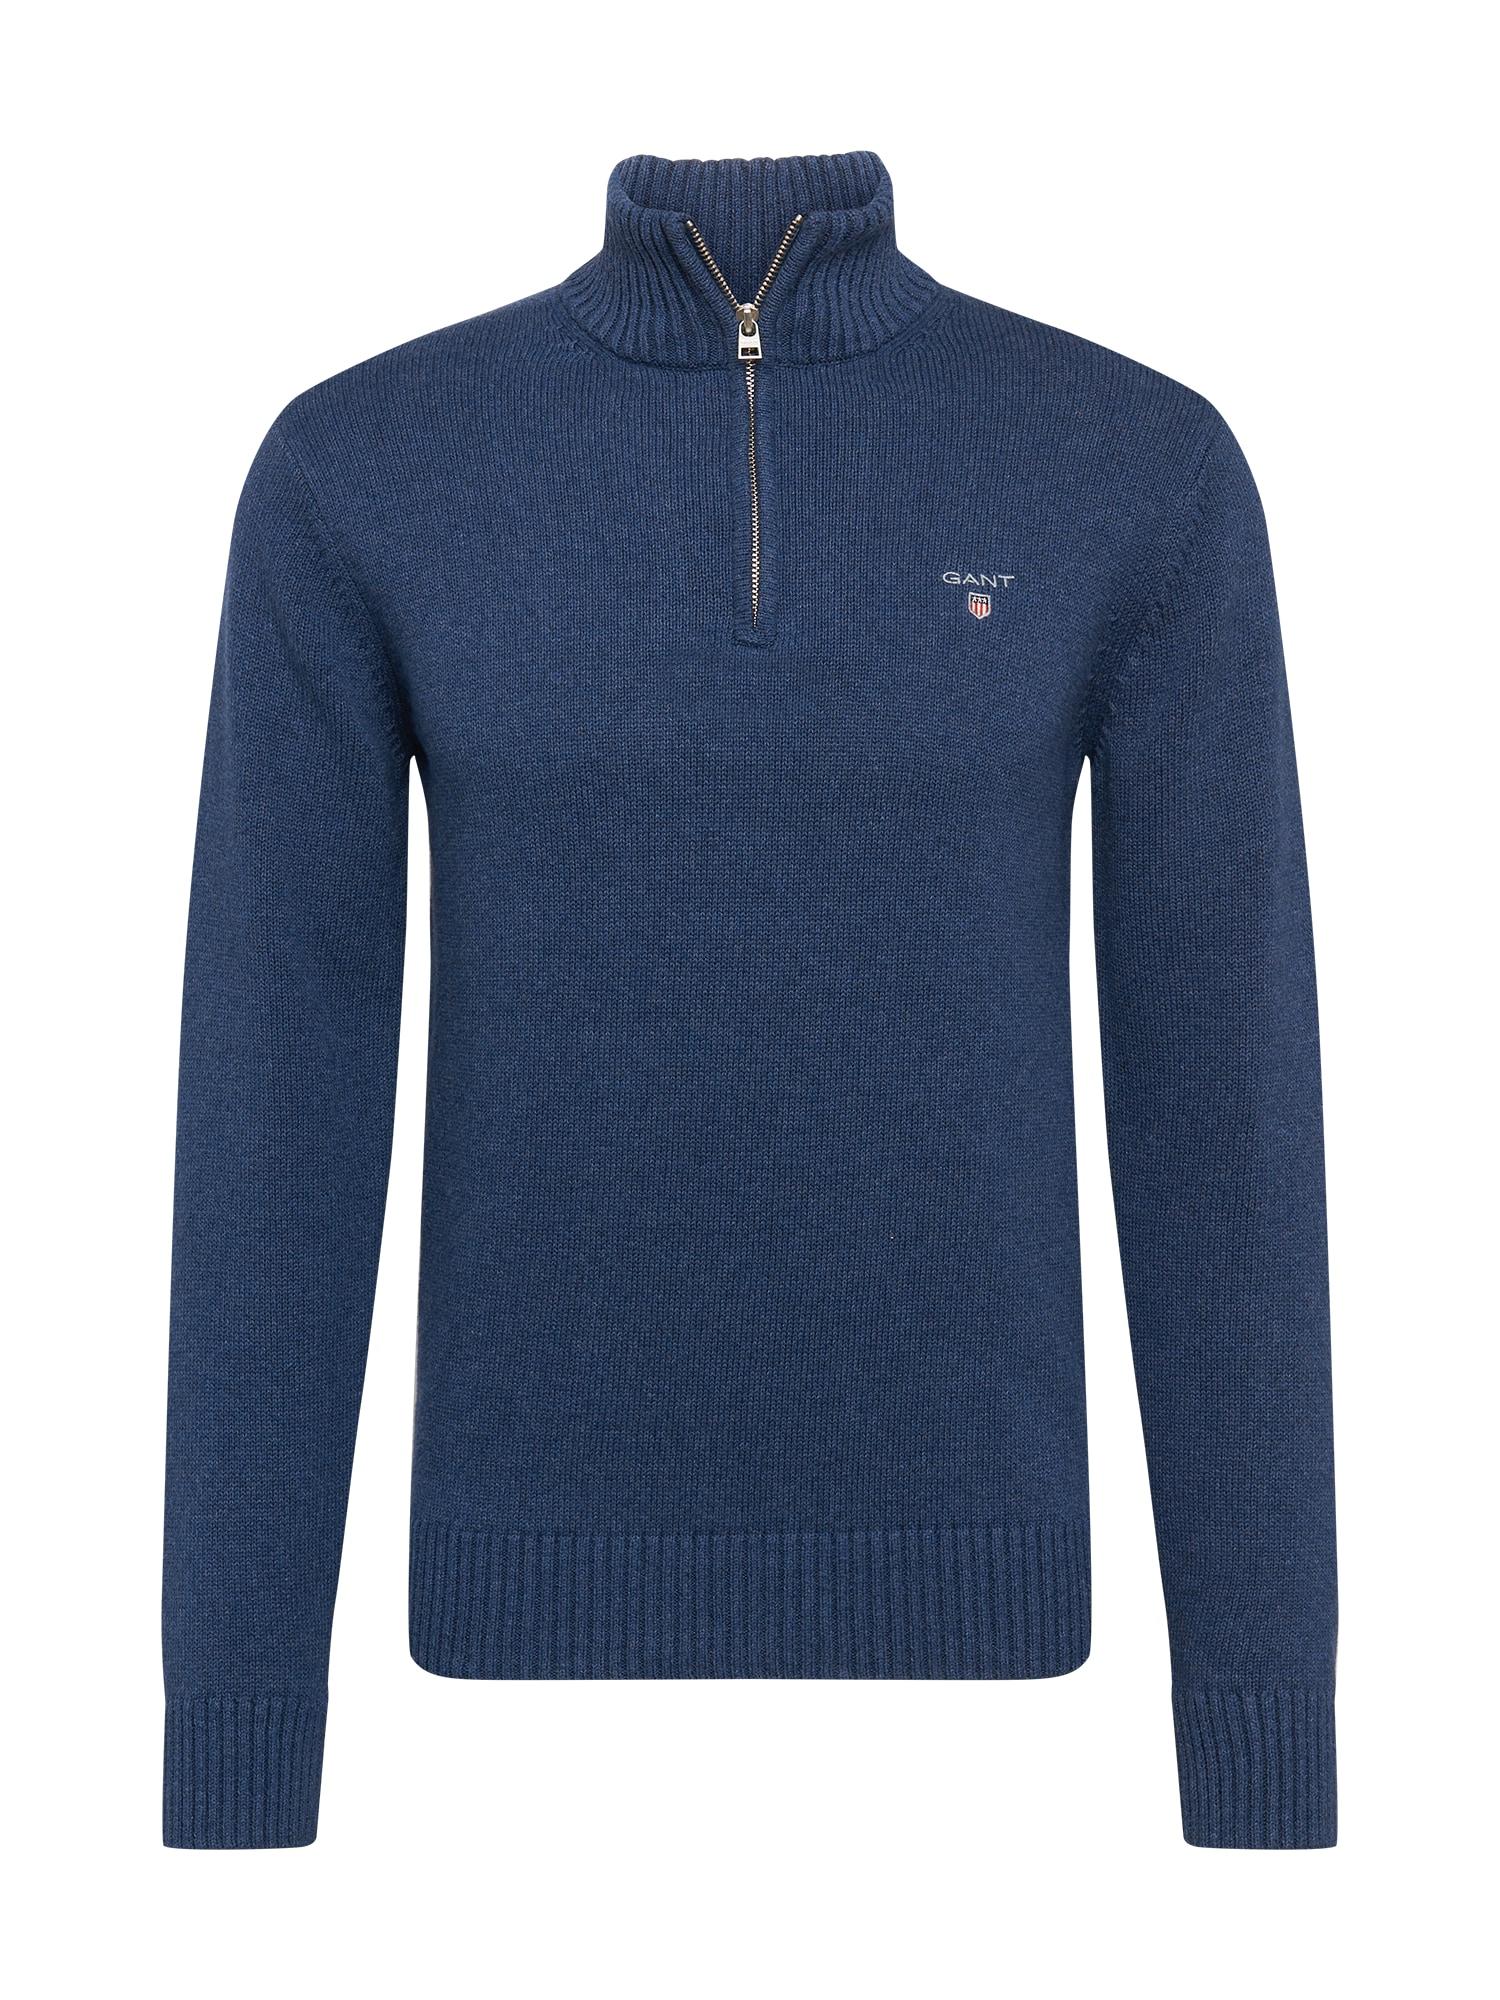 GANT Megztinis margai mėlyna